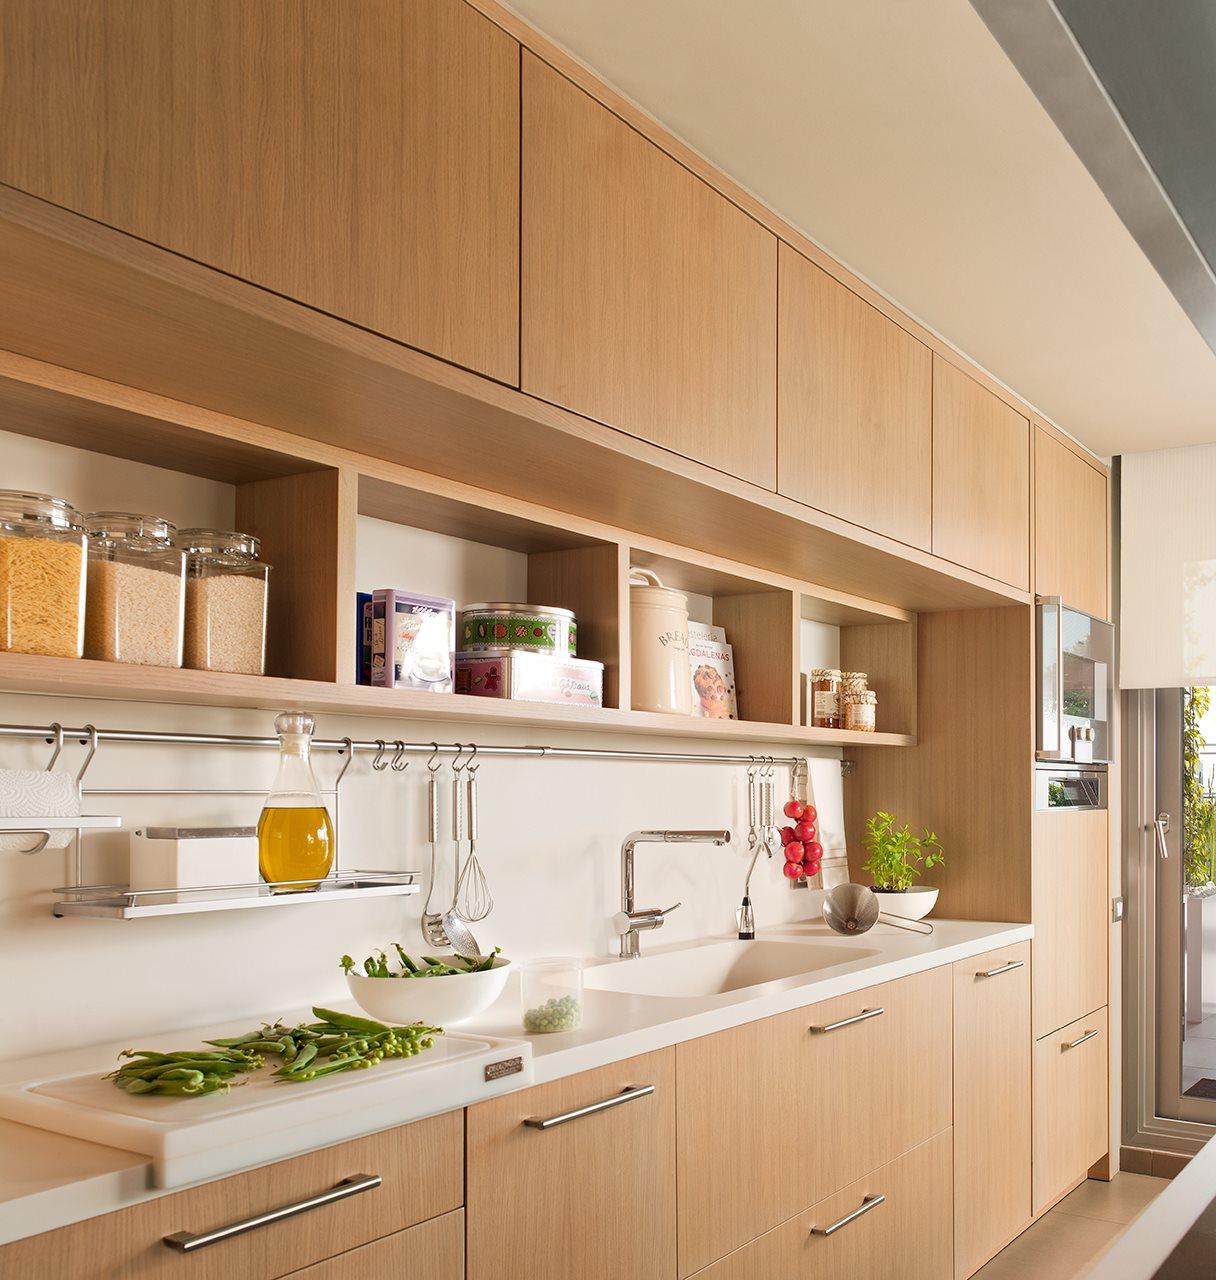 C mo aprovechar el espacio en cocinas peque as for Muebles de cocina pequena modernos